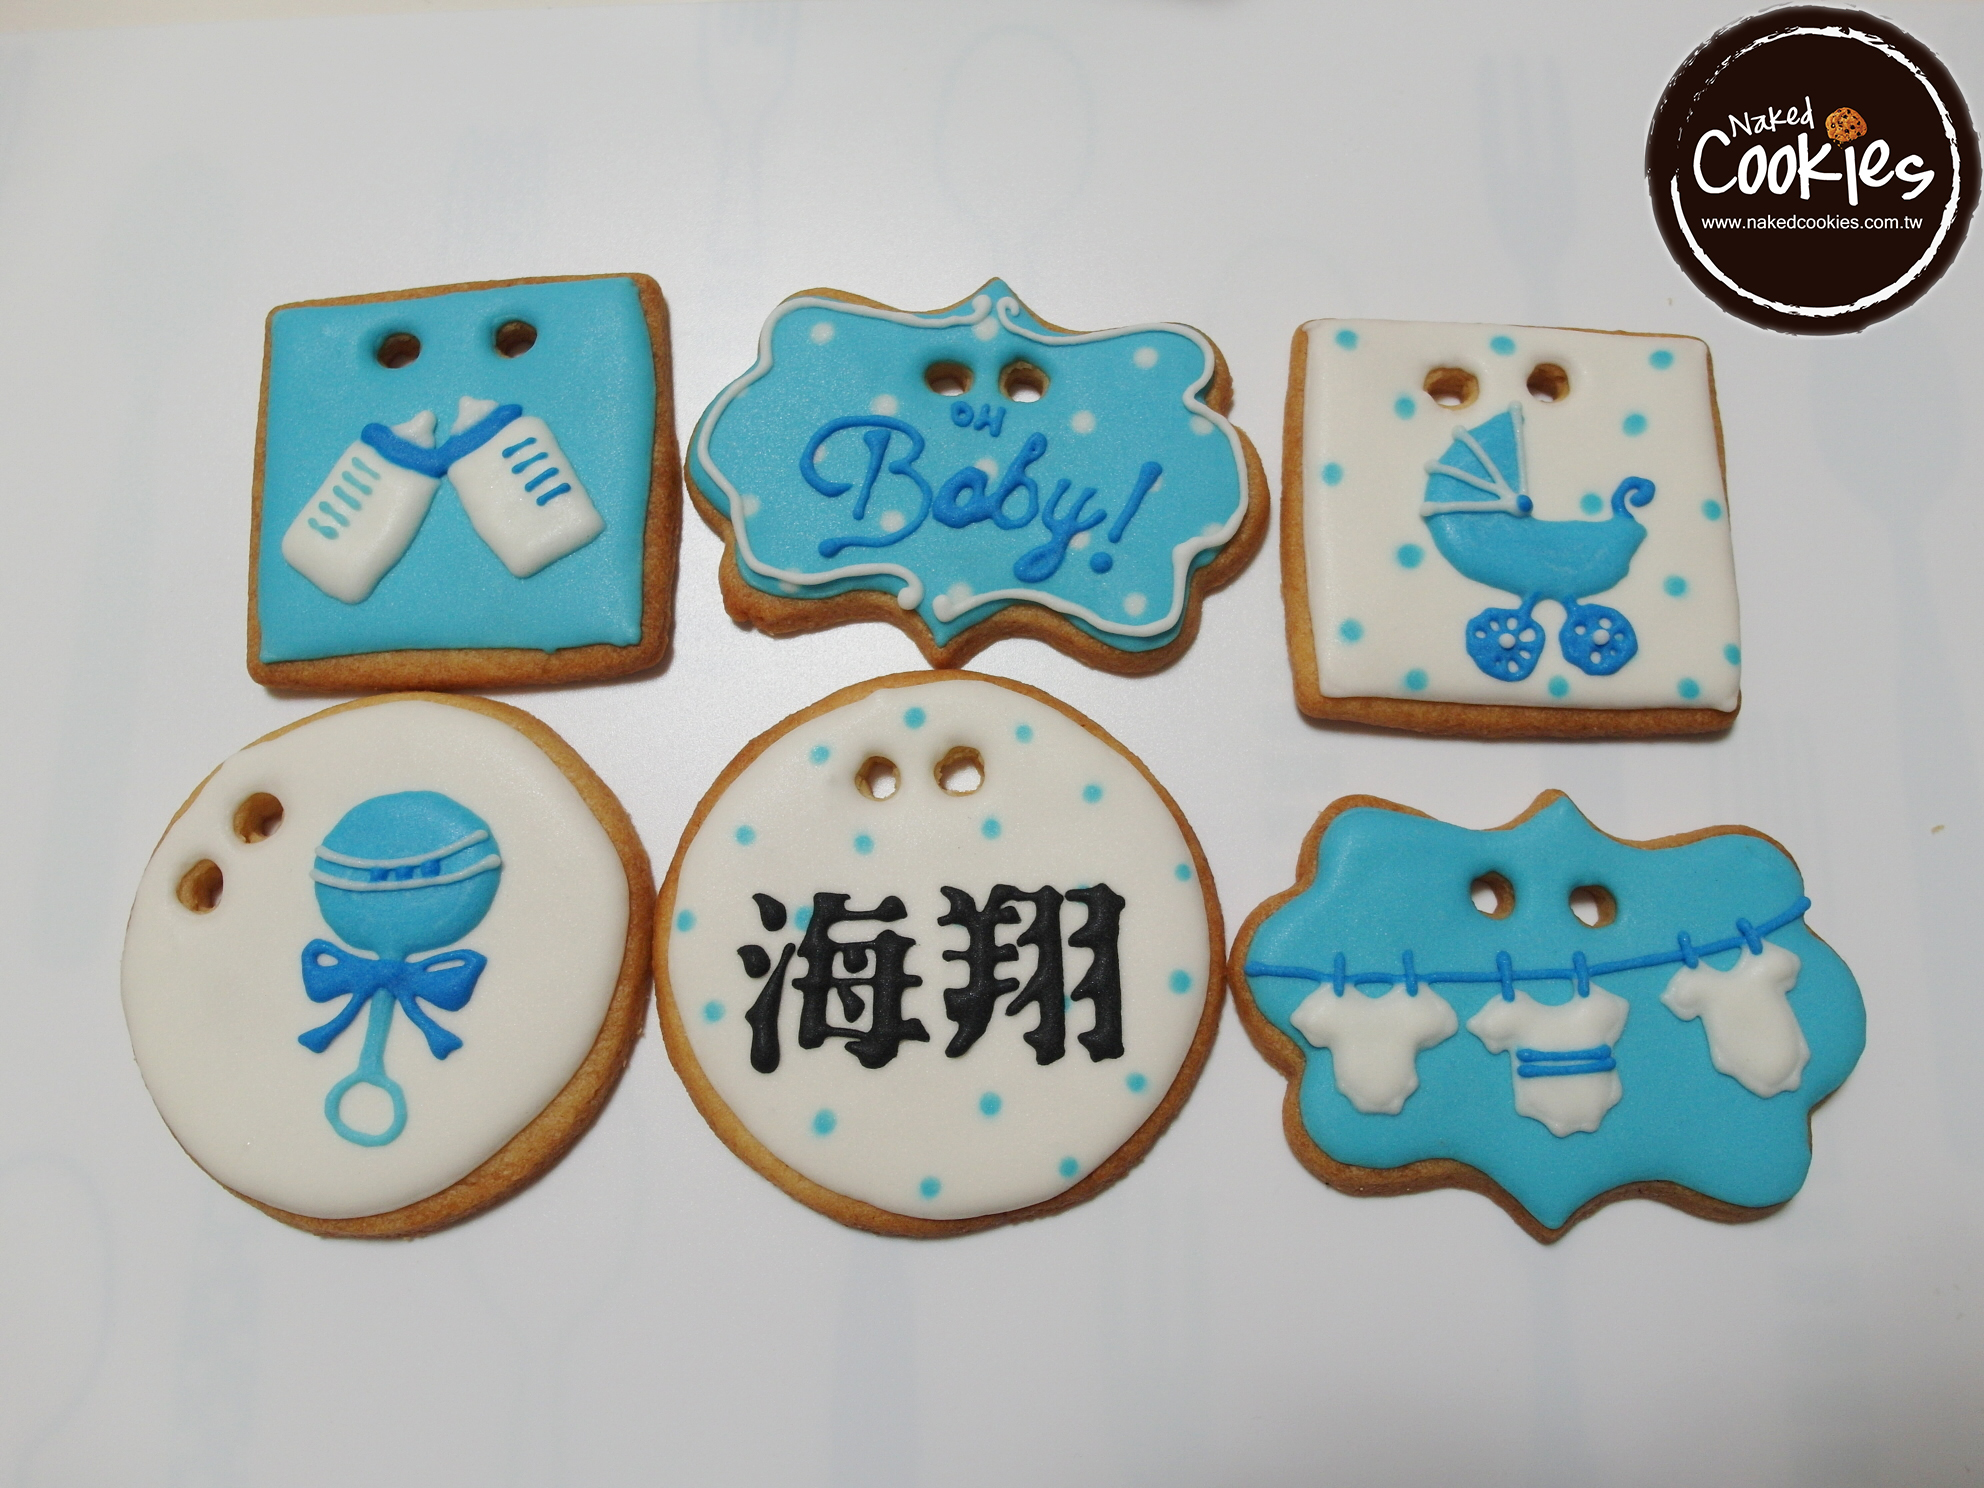 【Naked Cookies】男寶寶收涎6入-創意手工糖霜餅乾,婚禮/生日/活動/收涎/彌月